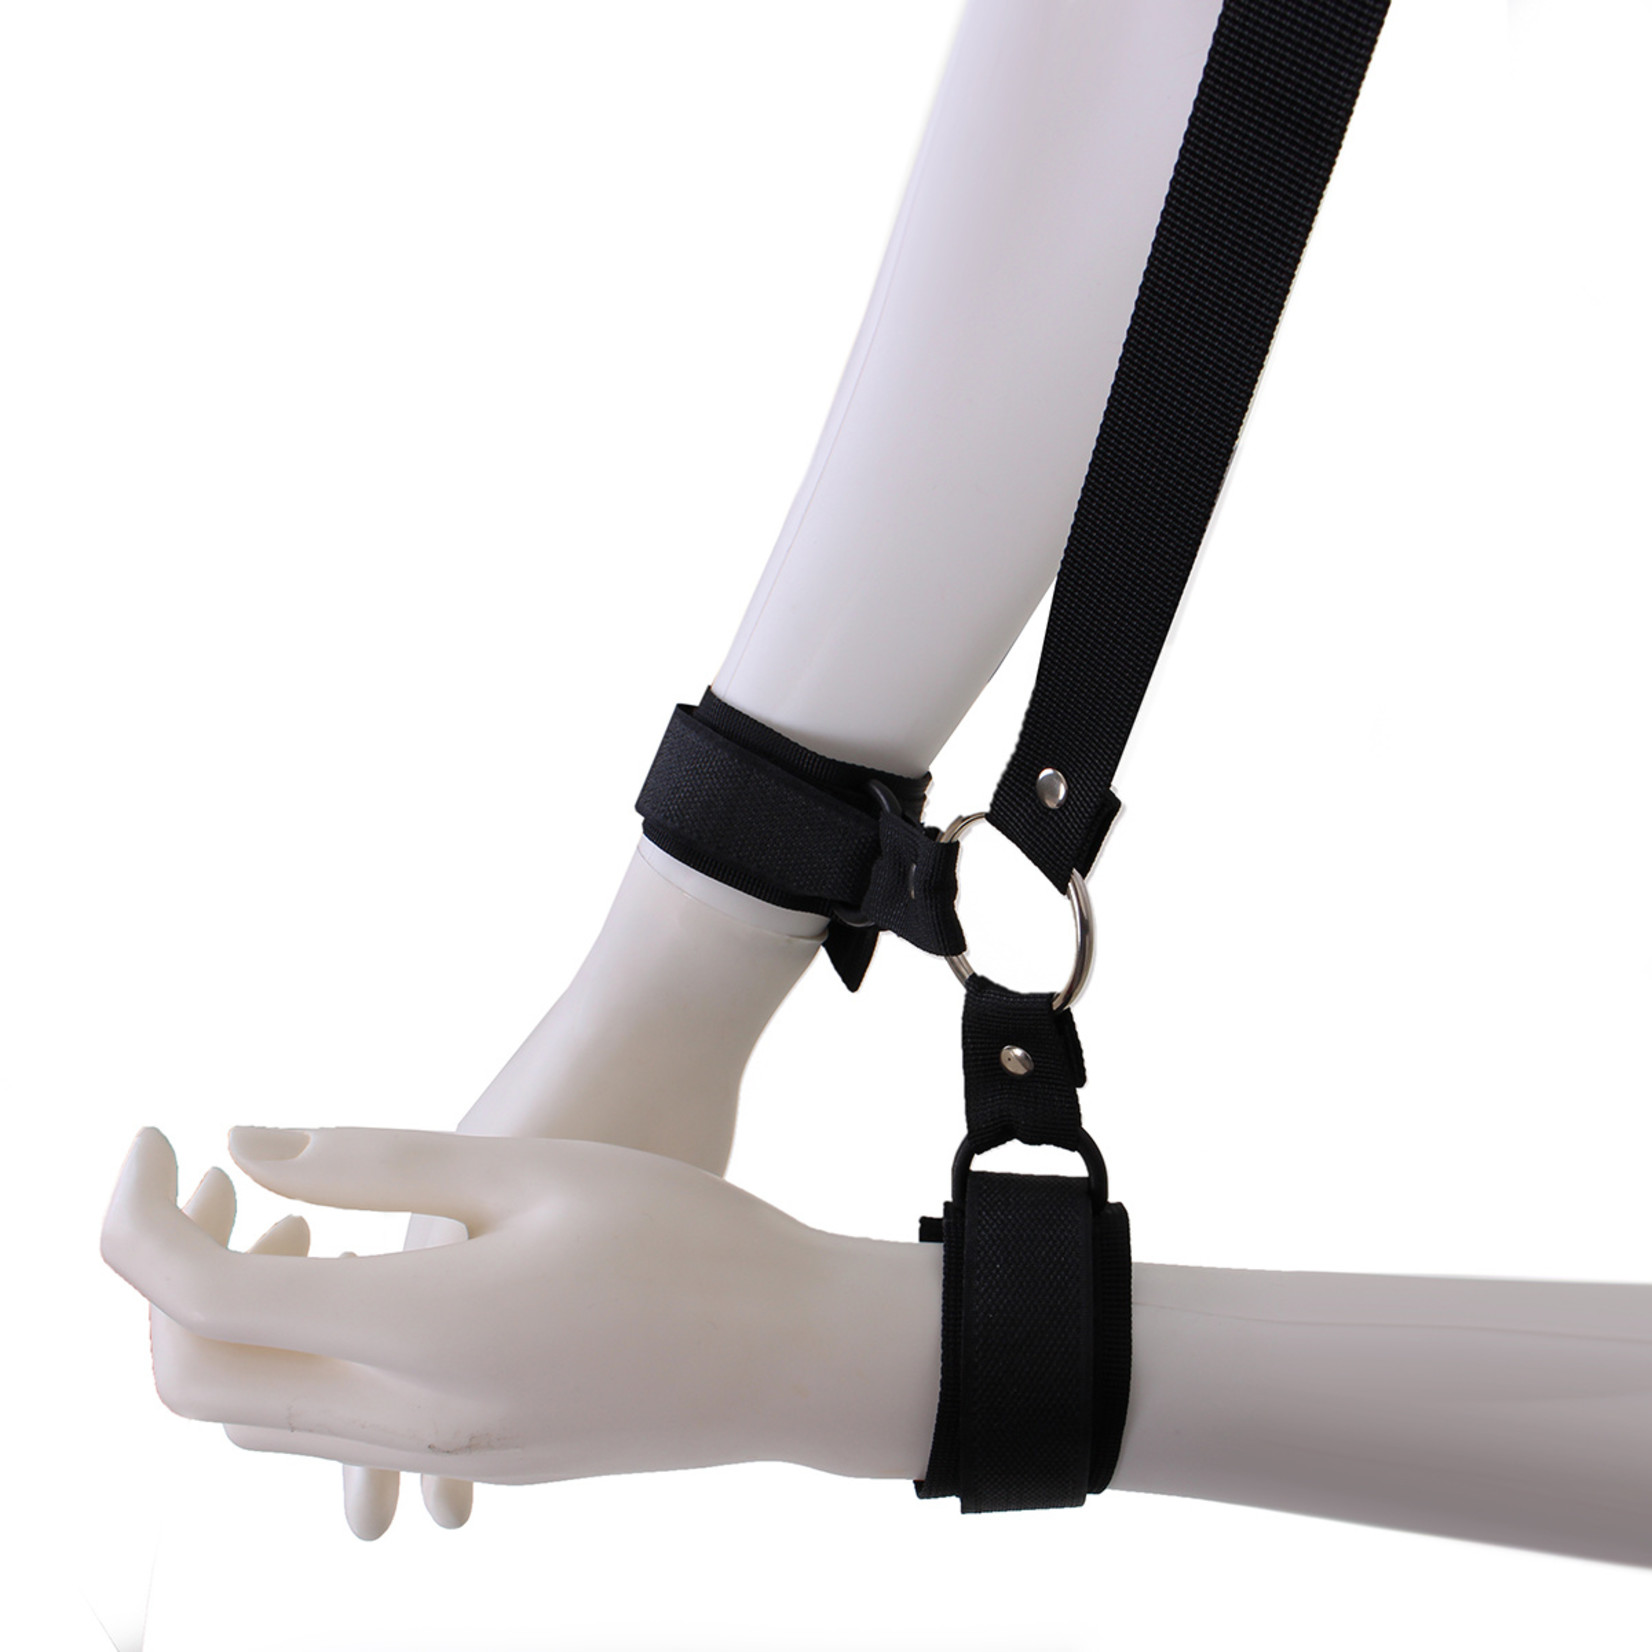 KIOTOS Leather Budget Collar & Wrist Restraints